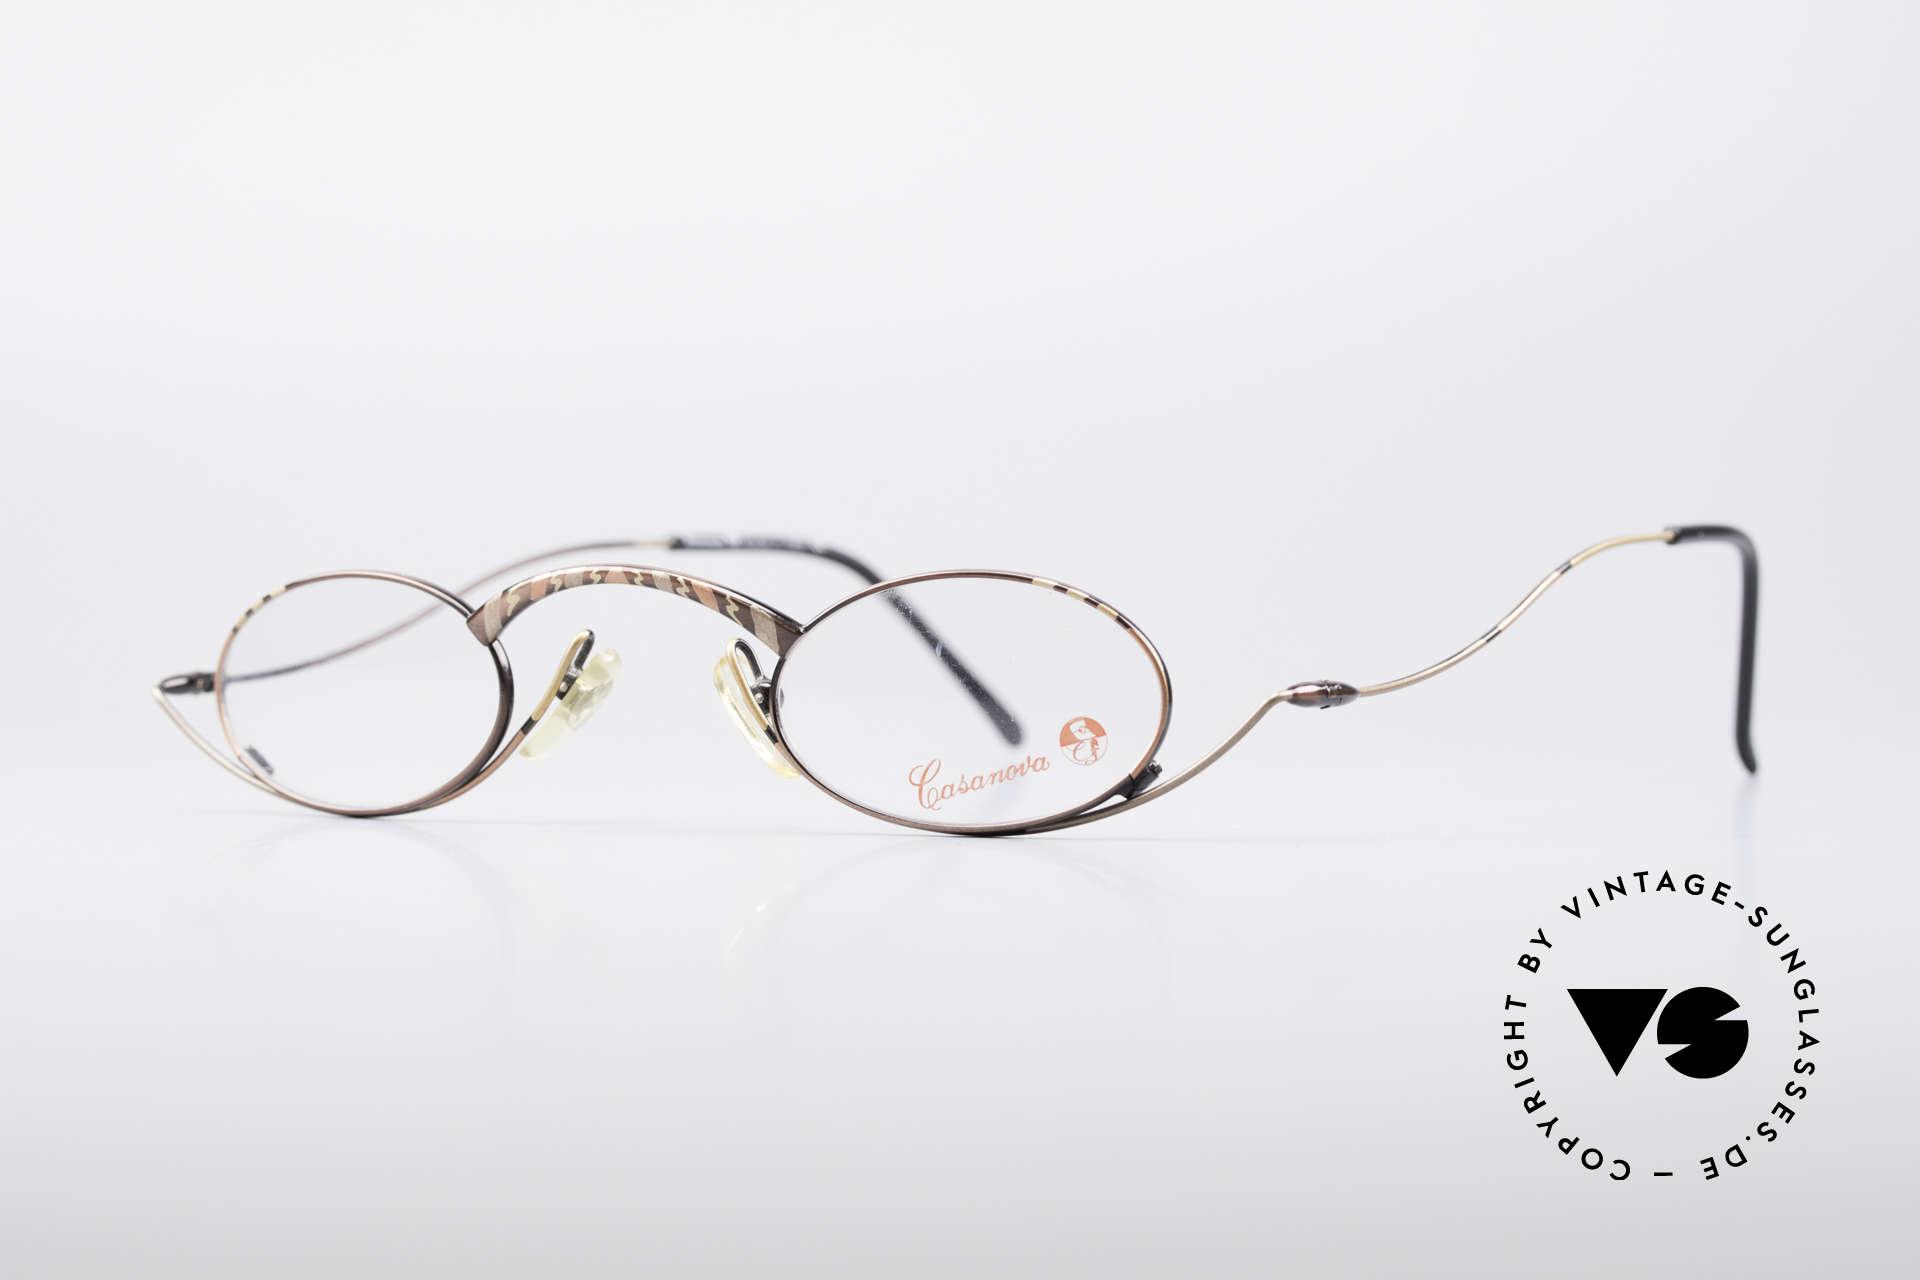 Casanova LC44 Vintage Reading Glasses, top-notch craftsmanship & very subtle frame pattern, Made for Men and Women